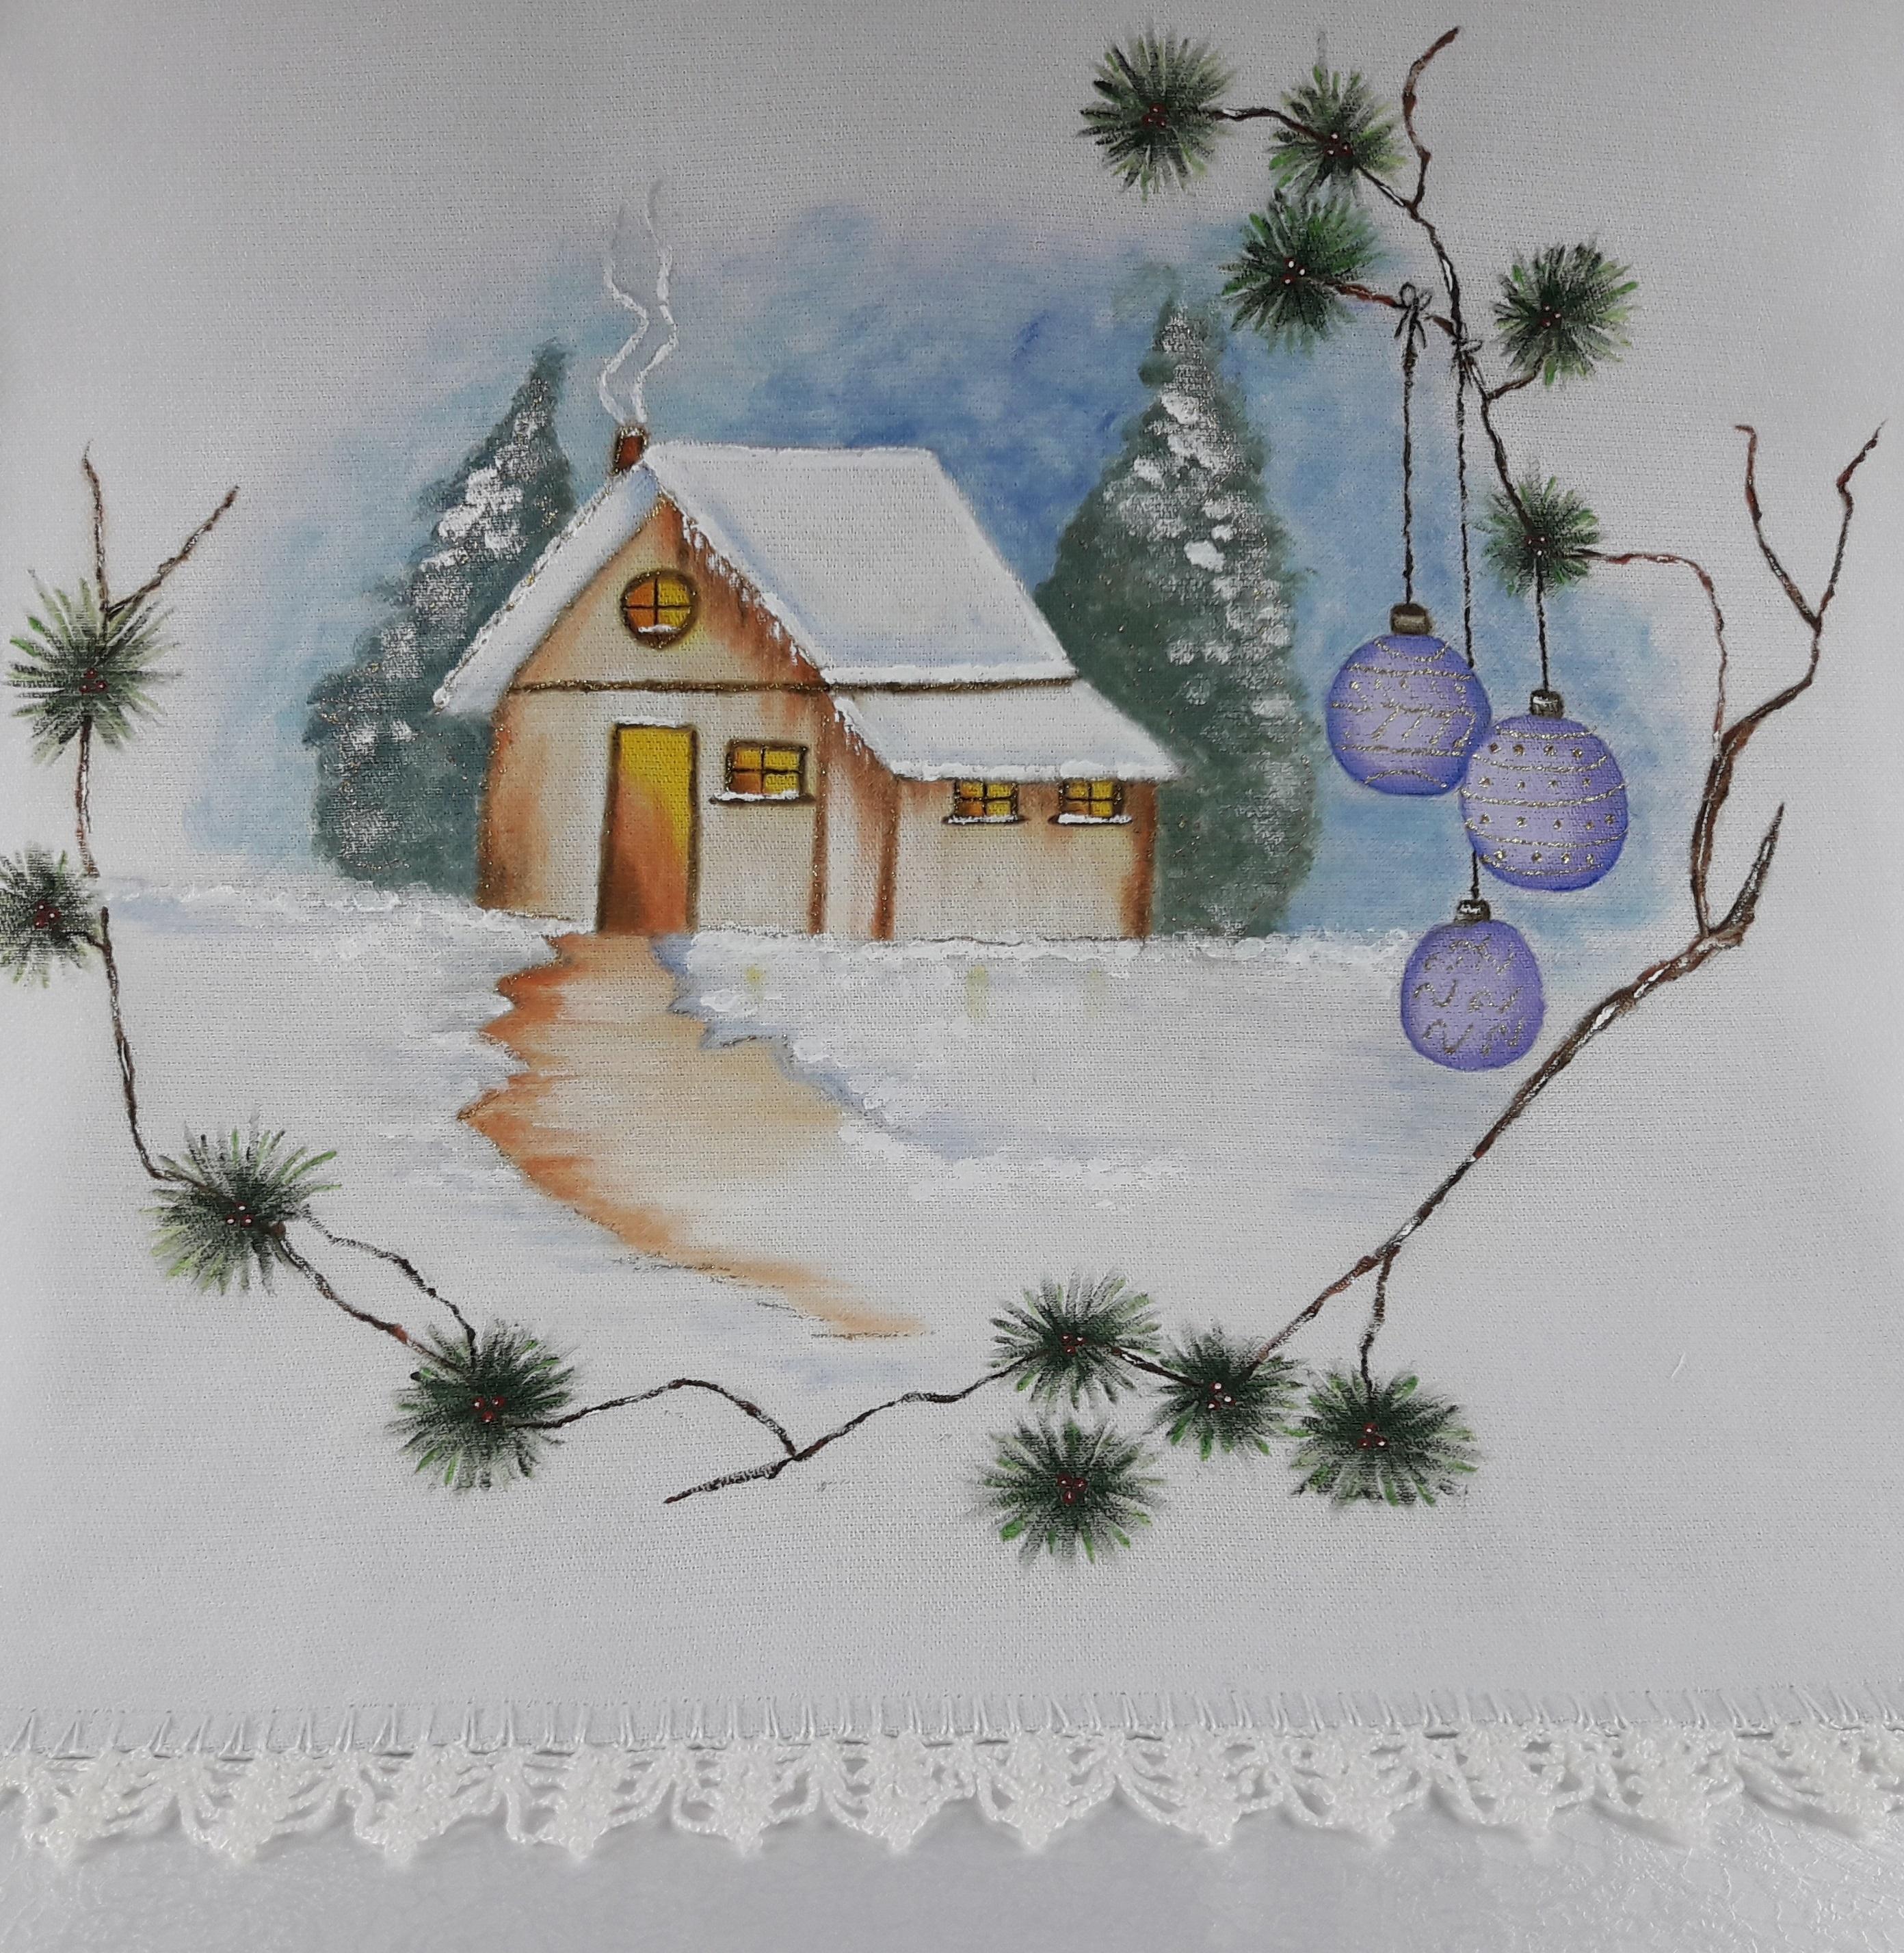 Pano De Prato Pintura Natal No Elo7 Bonecolandia Aff7e2